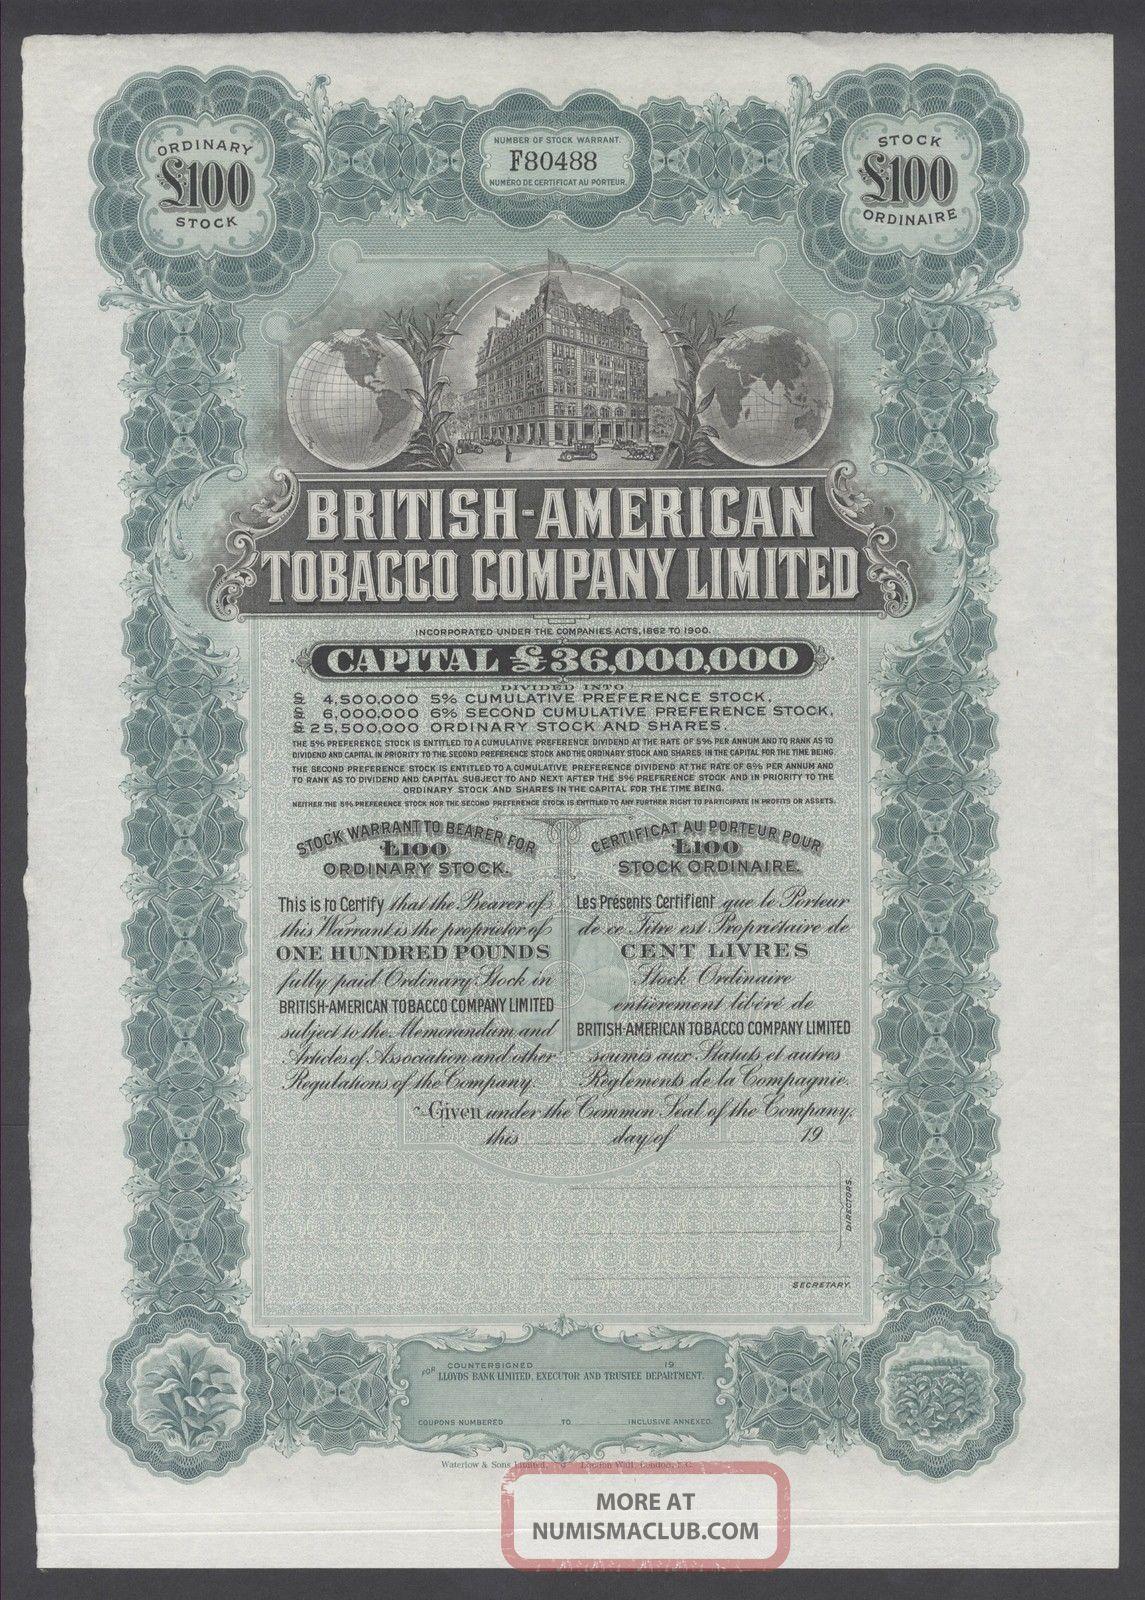 United States 1900s Uncirculated Ornate Bond British - American Tobacco Co.  R3333 World photo